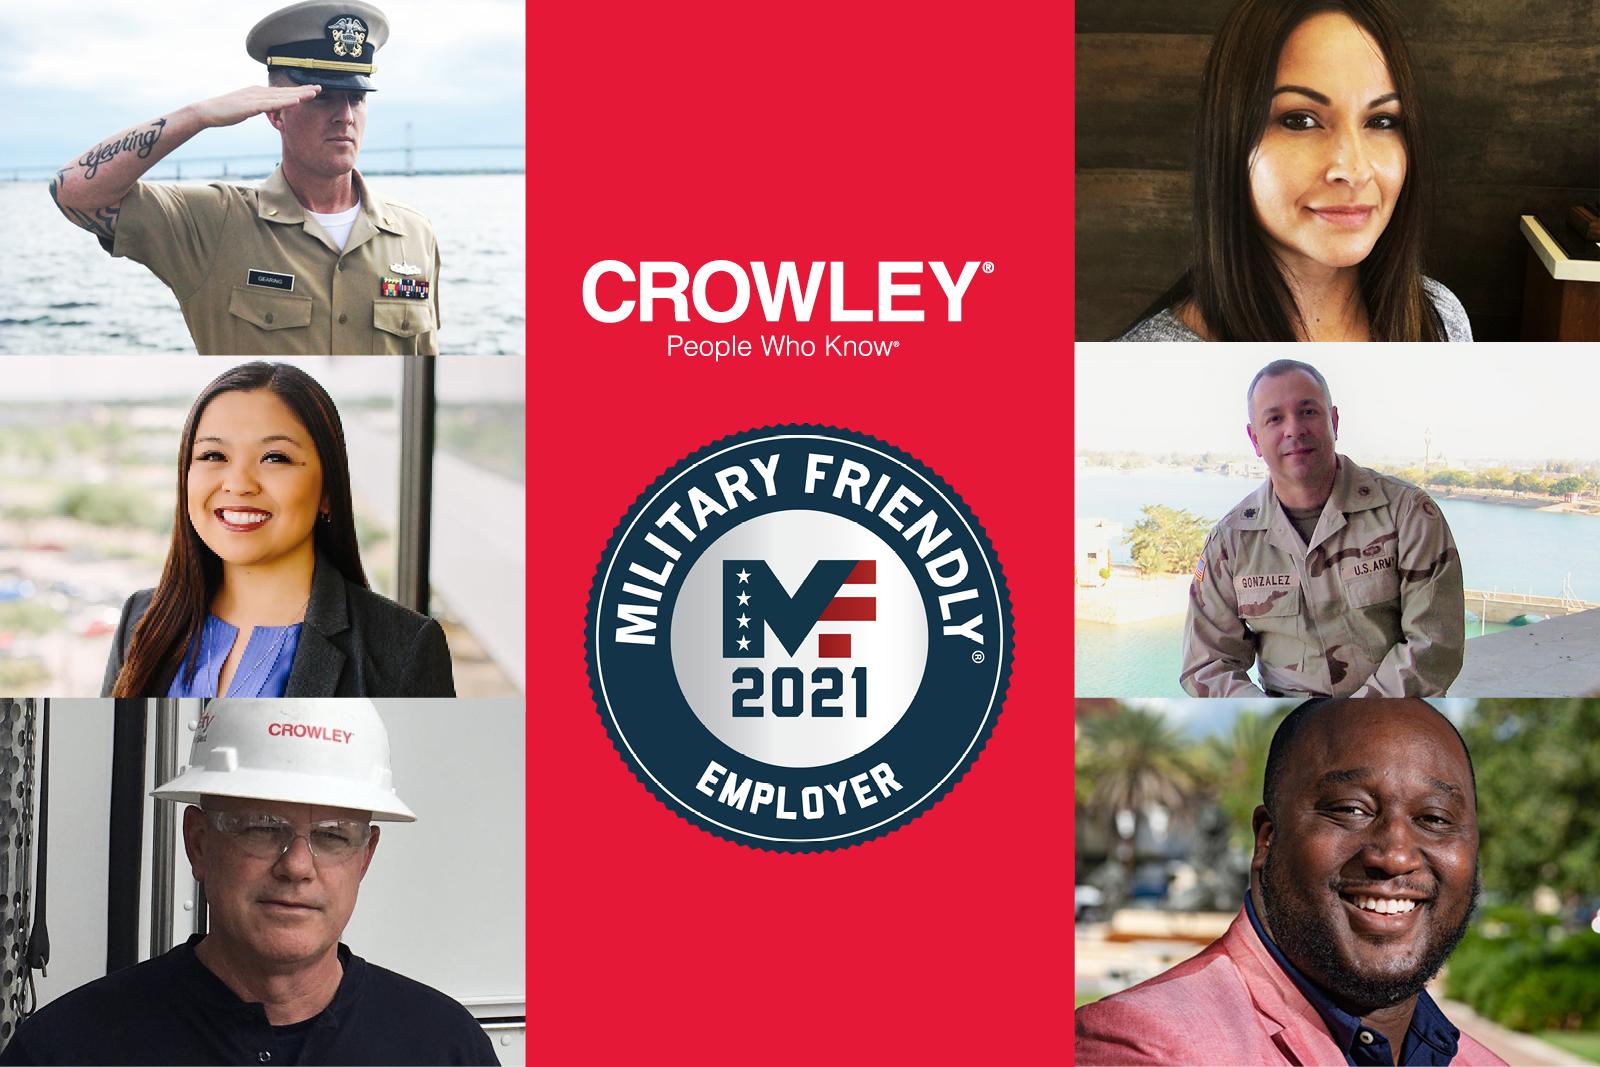 Crowley received Military Friendly employer designation